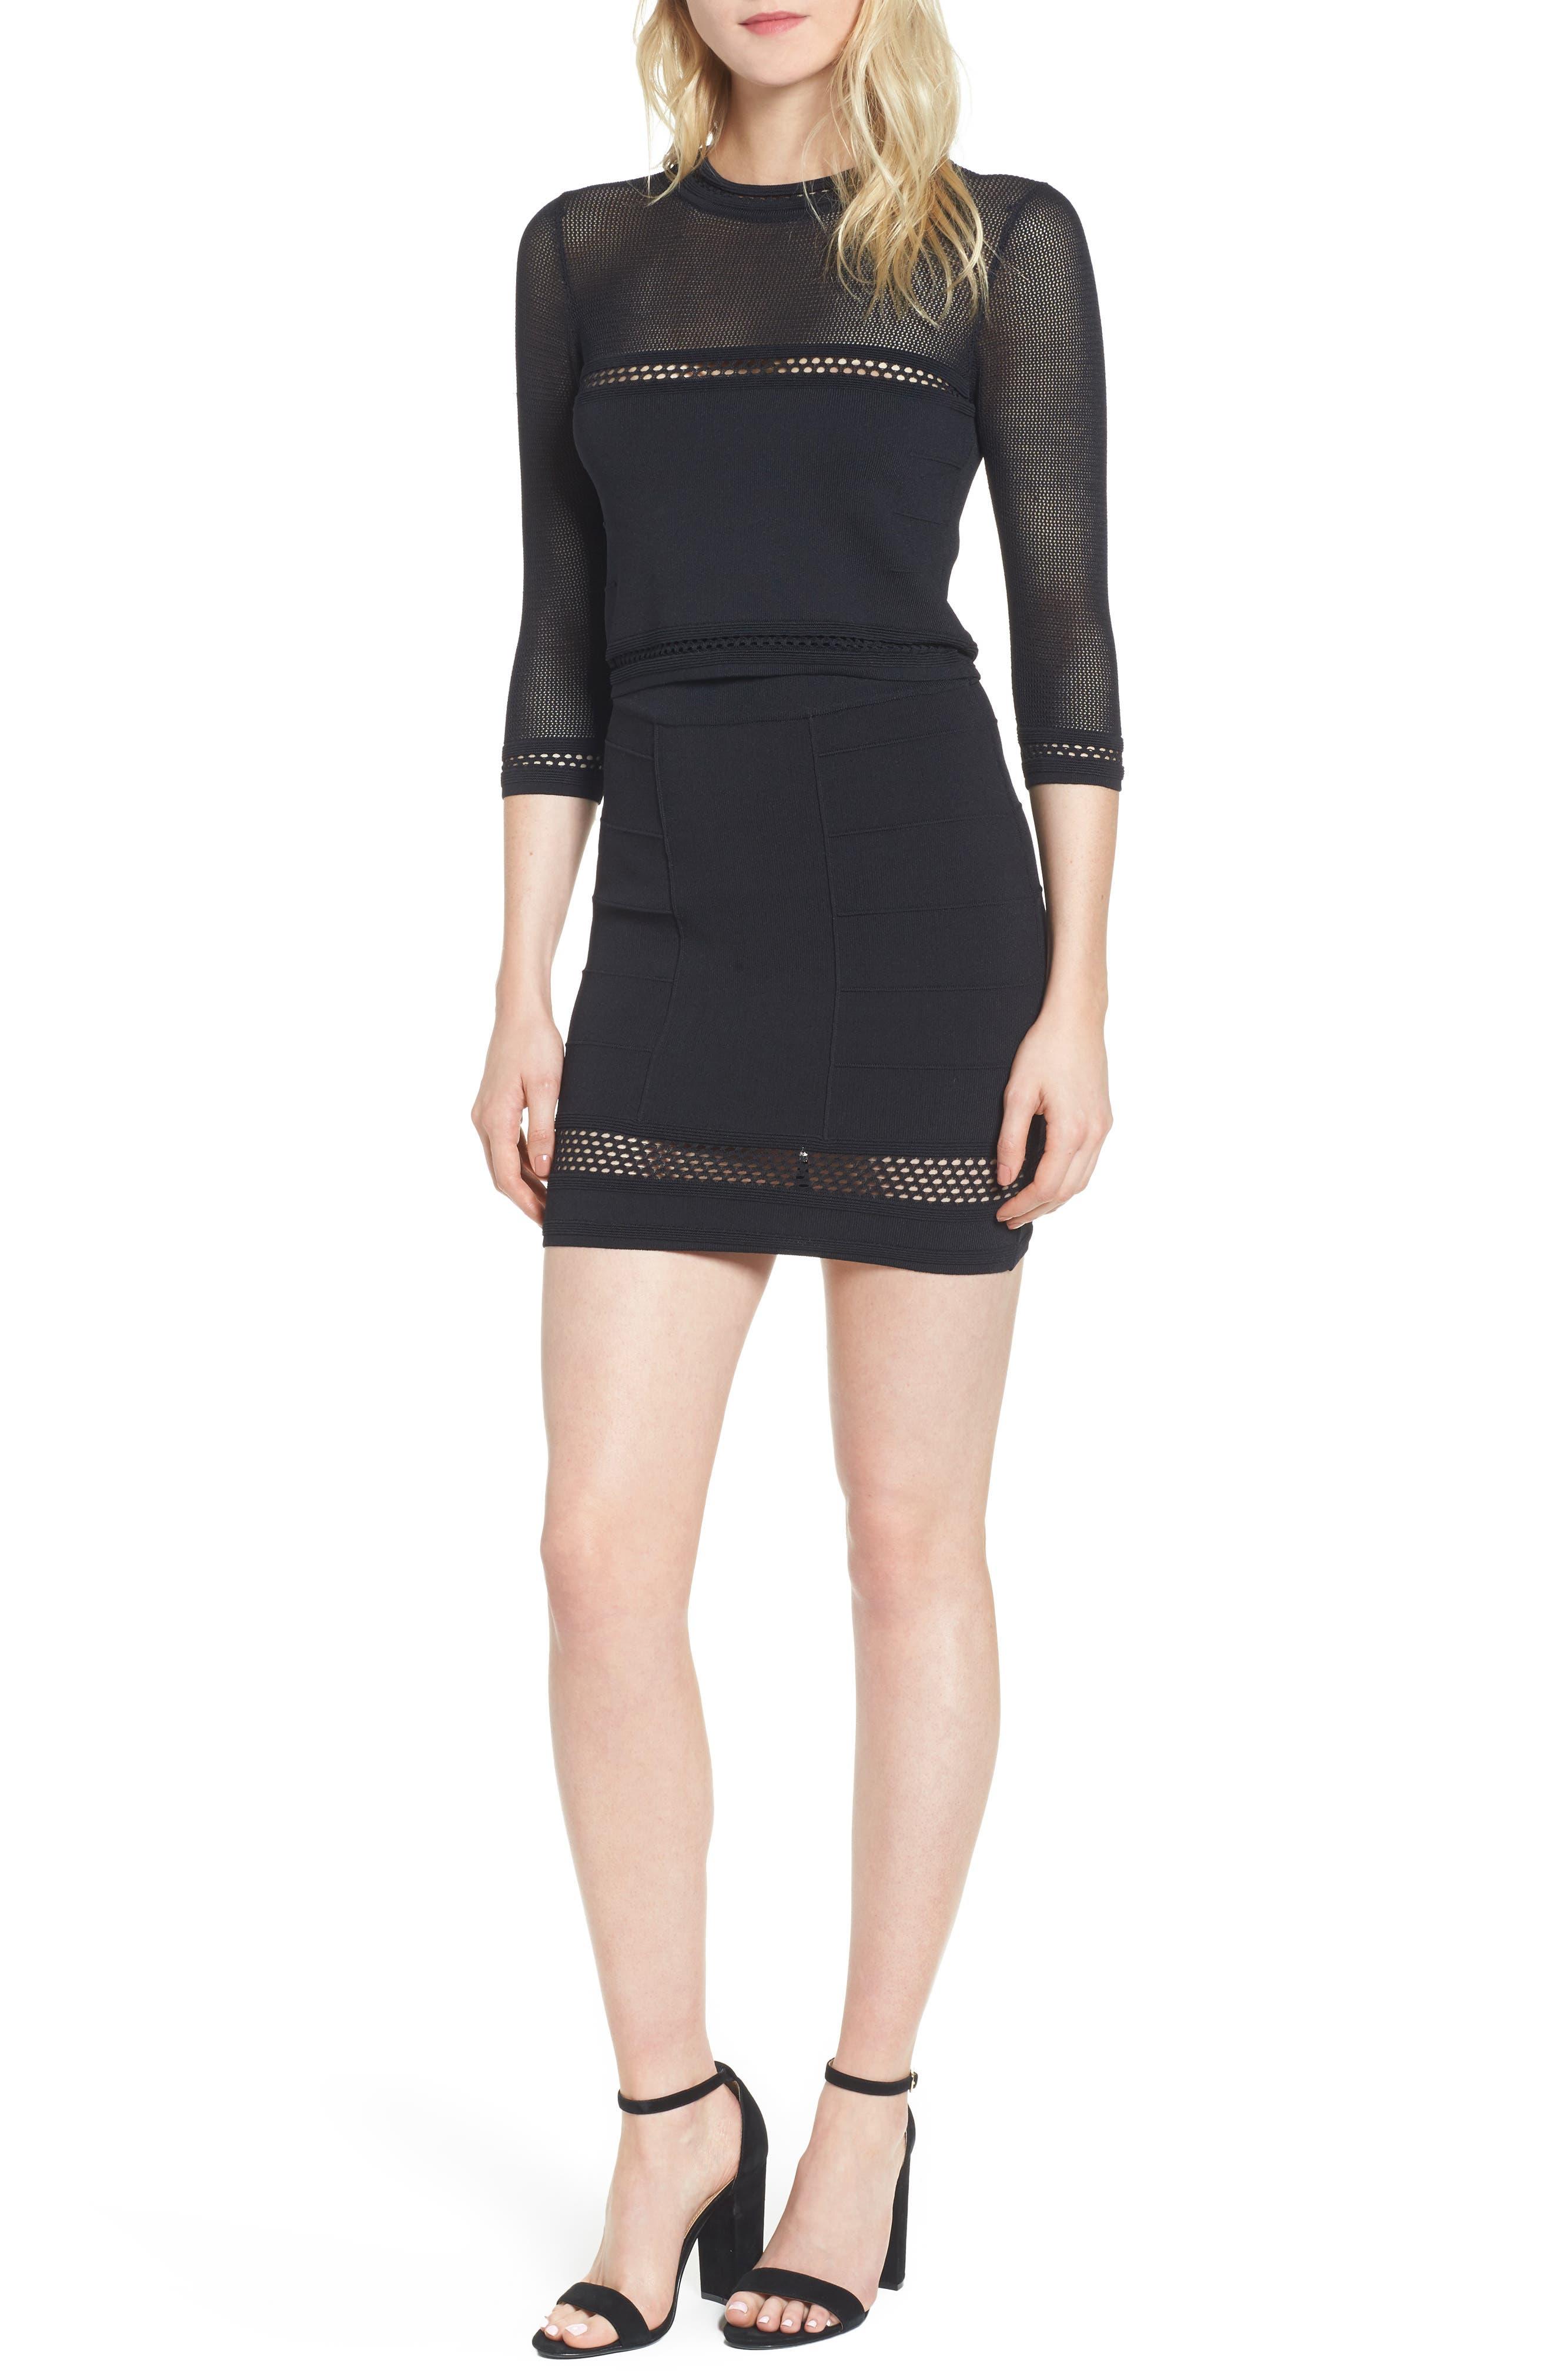 Bishop + Young Siena Peekaboo Skirt,                             Main thumbnail 1, color,                             Black